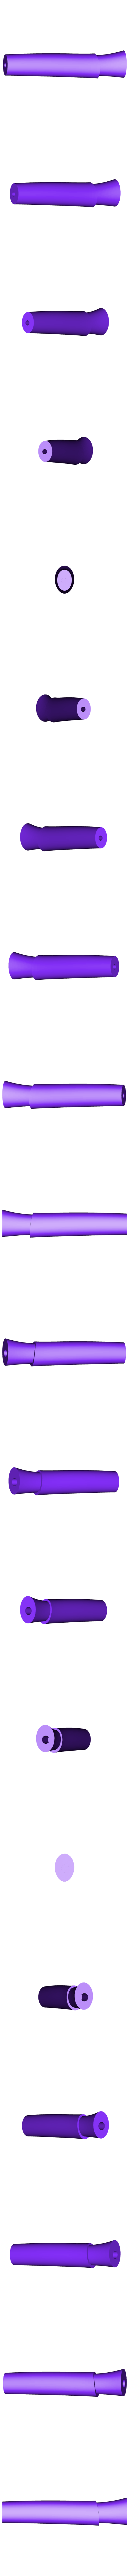 handle1.stl Download STL file Fortnite's axe! / Fortnite Axe! • 3D print design, MLBdesign